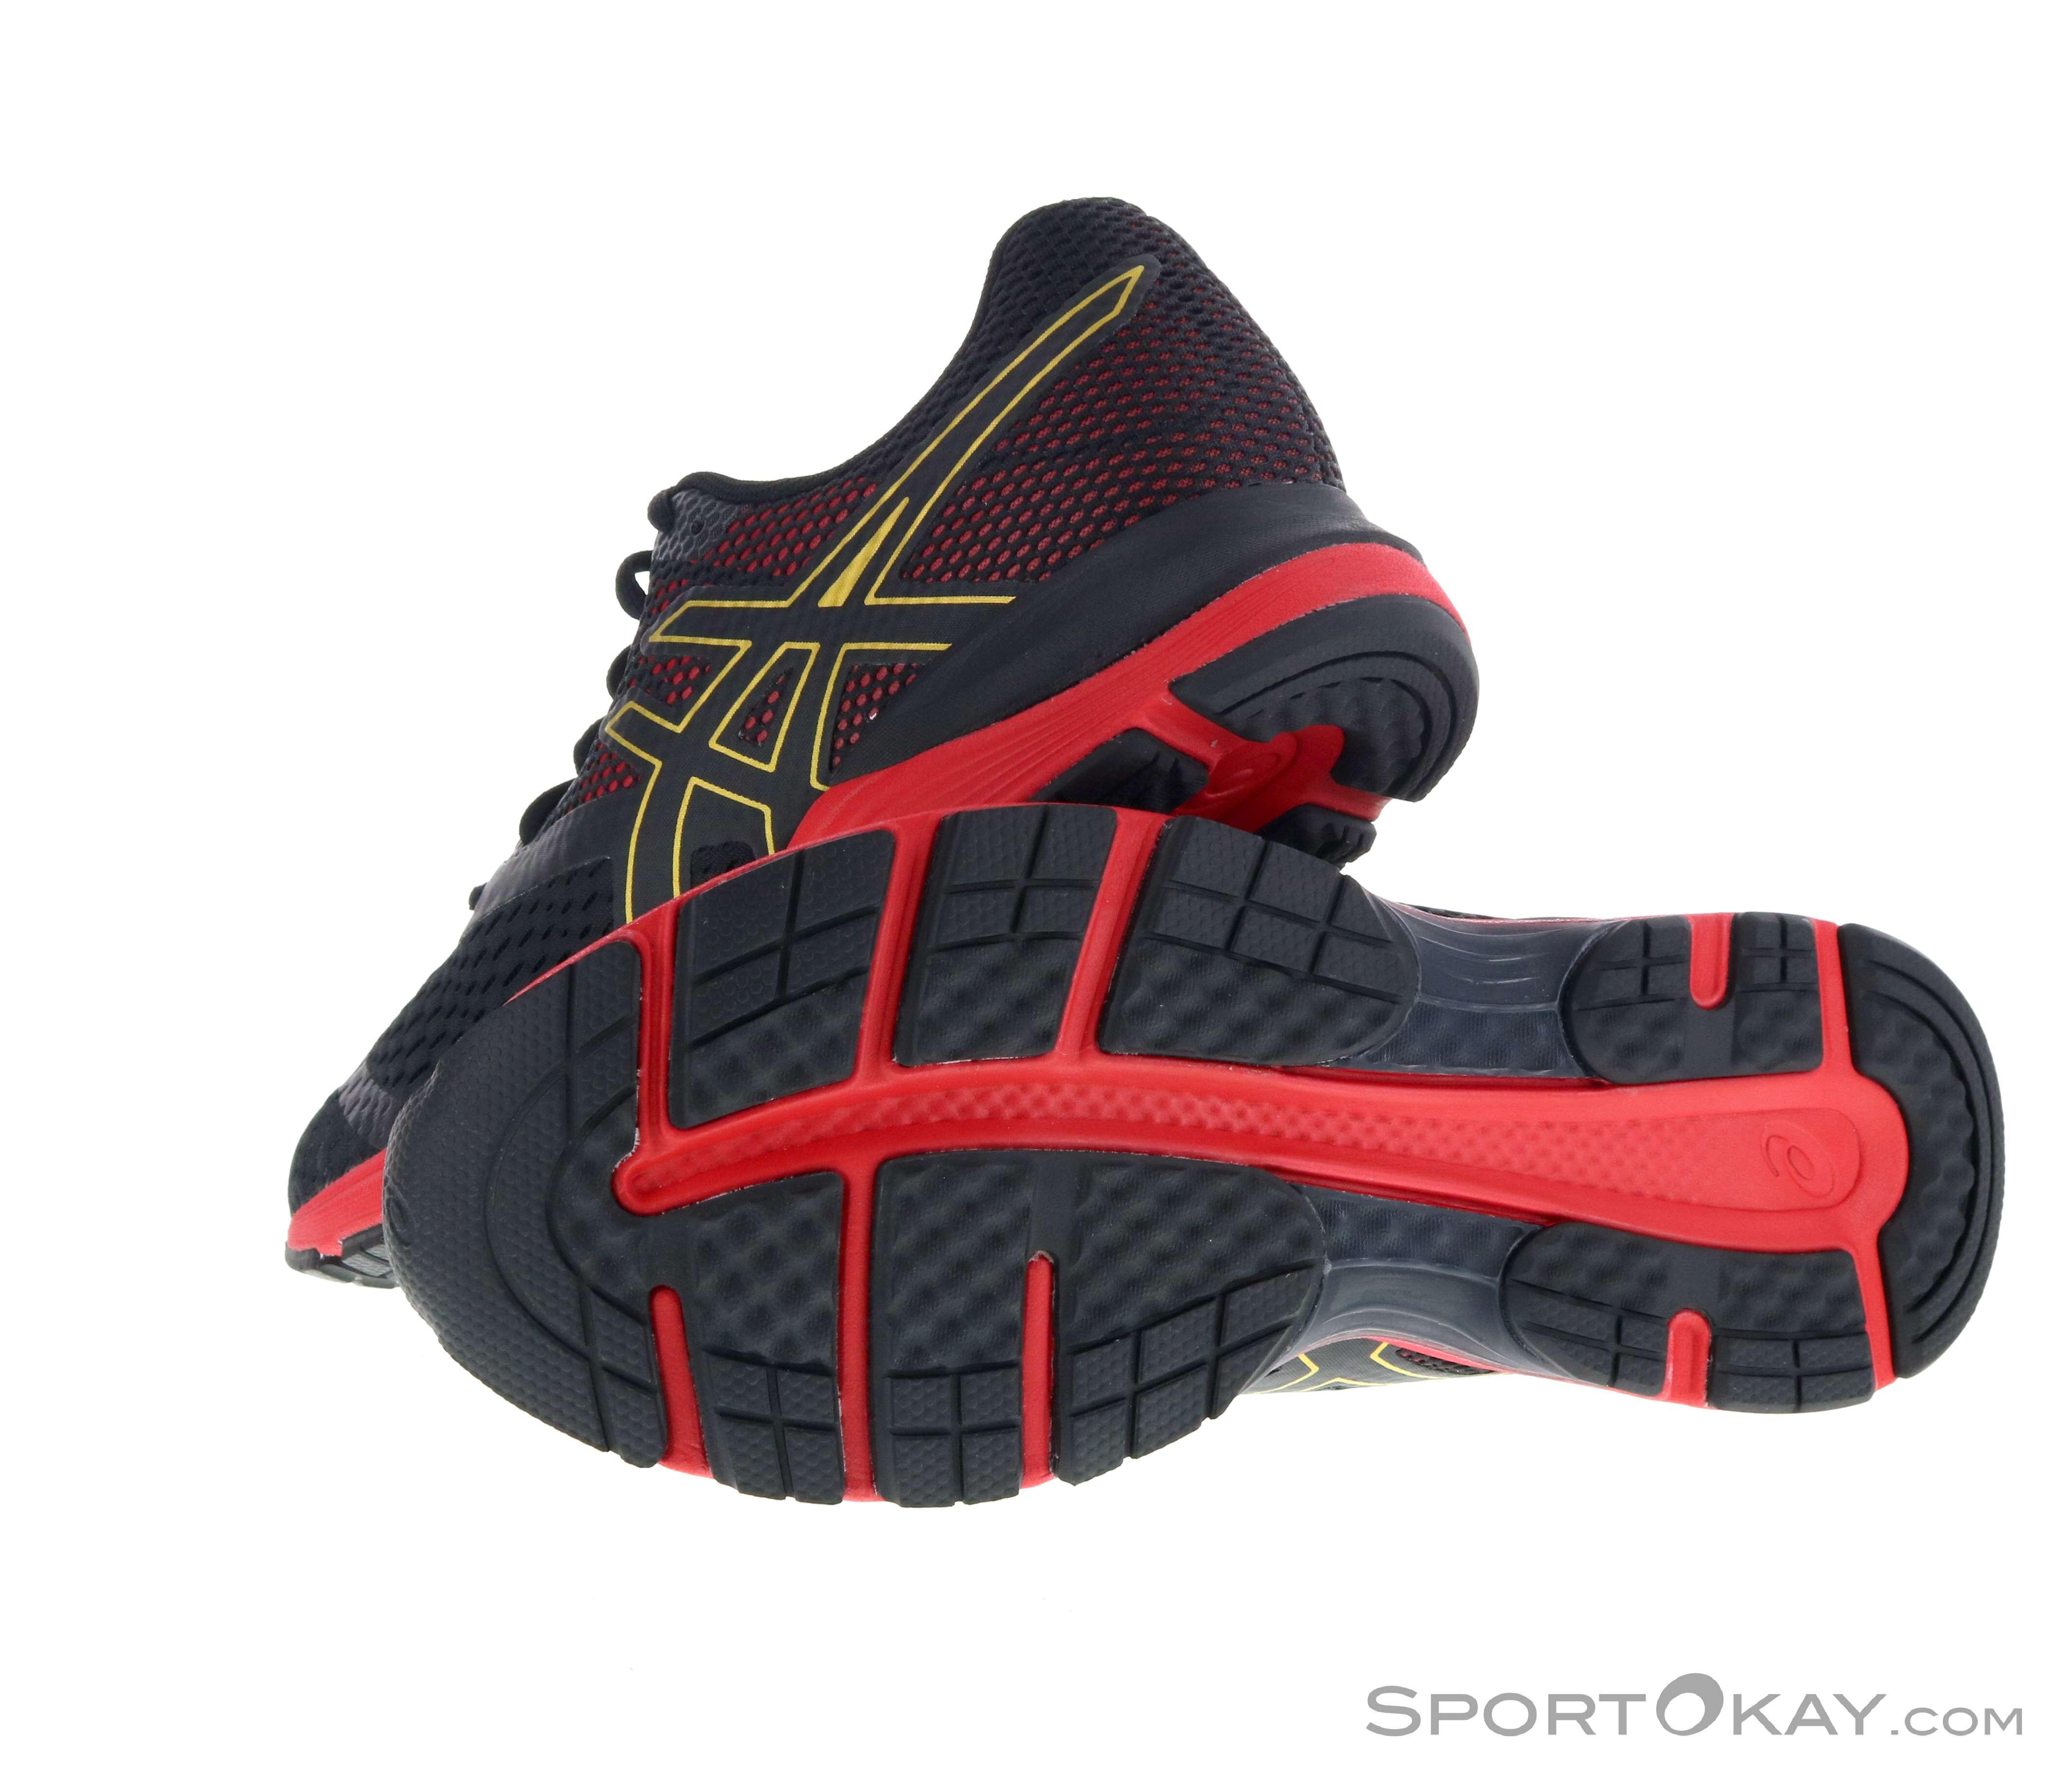 Asics Asics Gel Pulse Mens Running Shoes